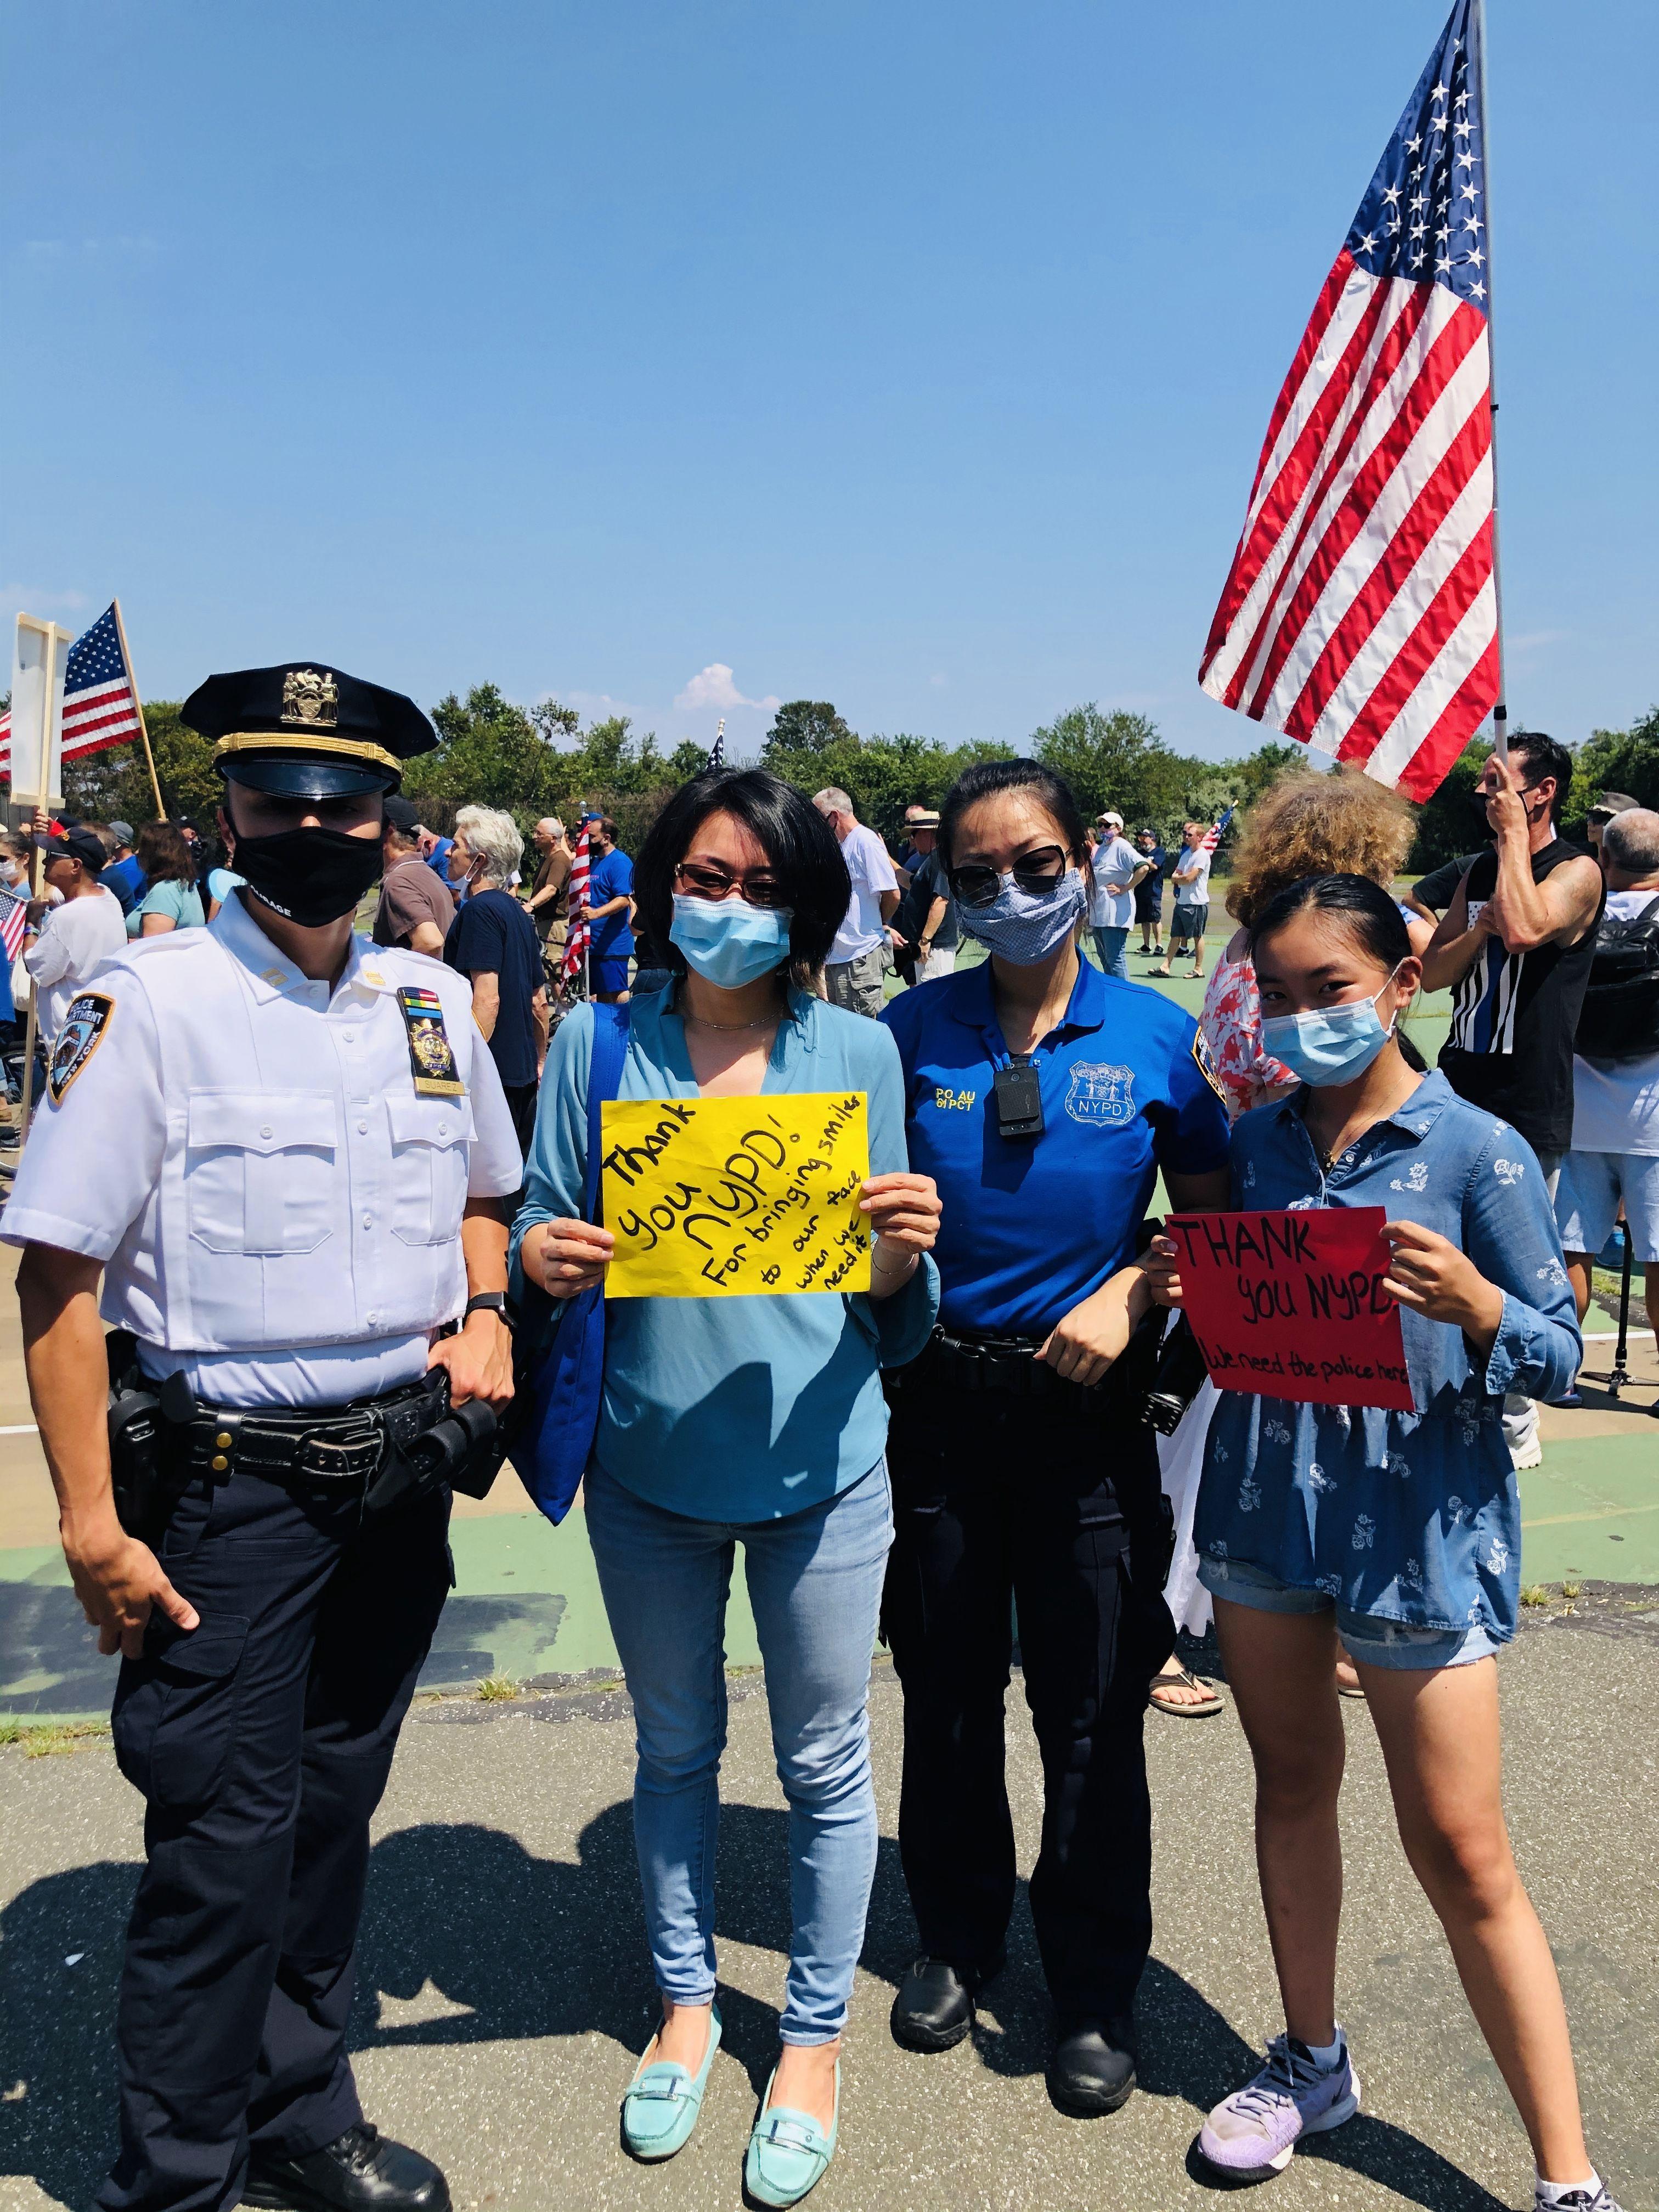 ■( 左 至 右 ) 市 警 6 1 分 局 副 局 長 K r y s t i n Suarez、陳麗娜、社區聯絡官歐陽佩儀及 Maggie參與集會與遊行。 主辦方提供